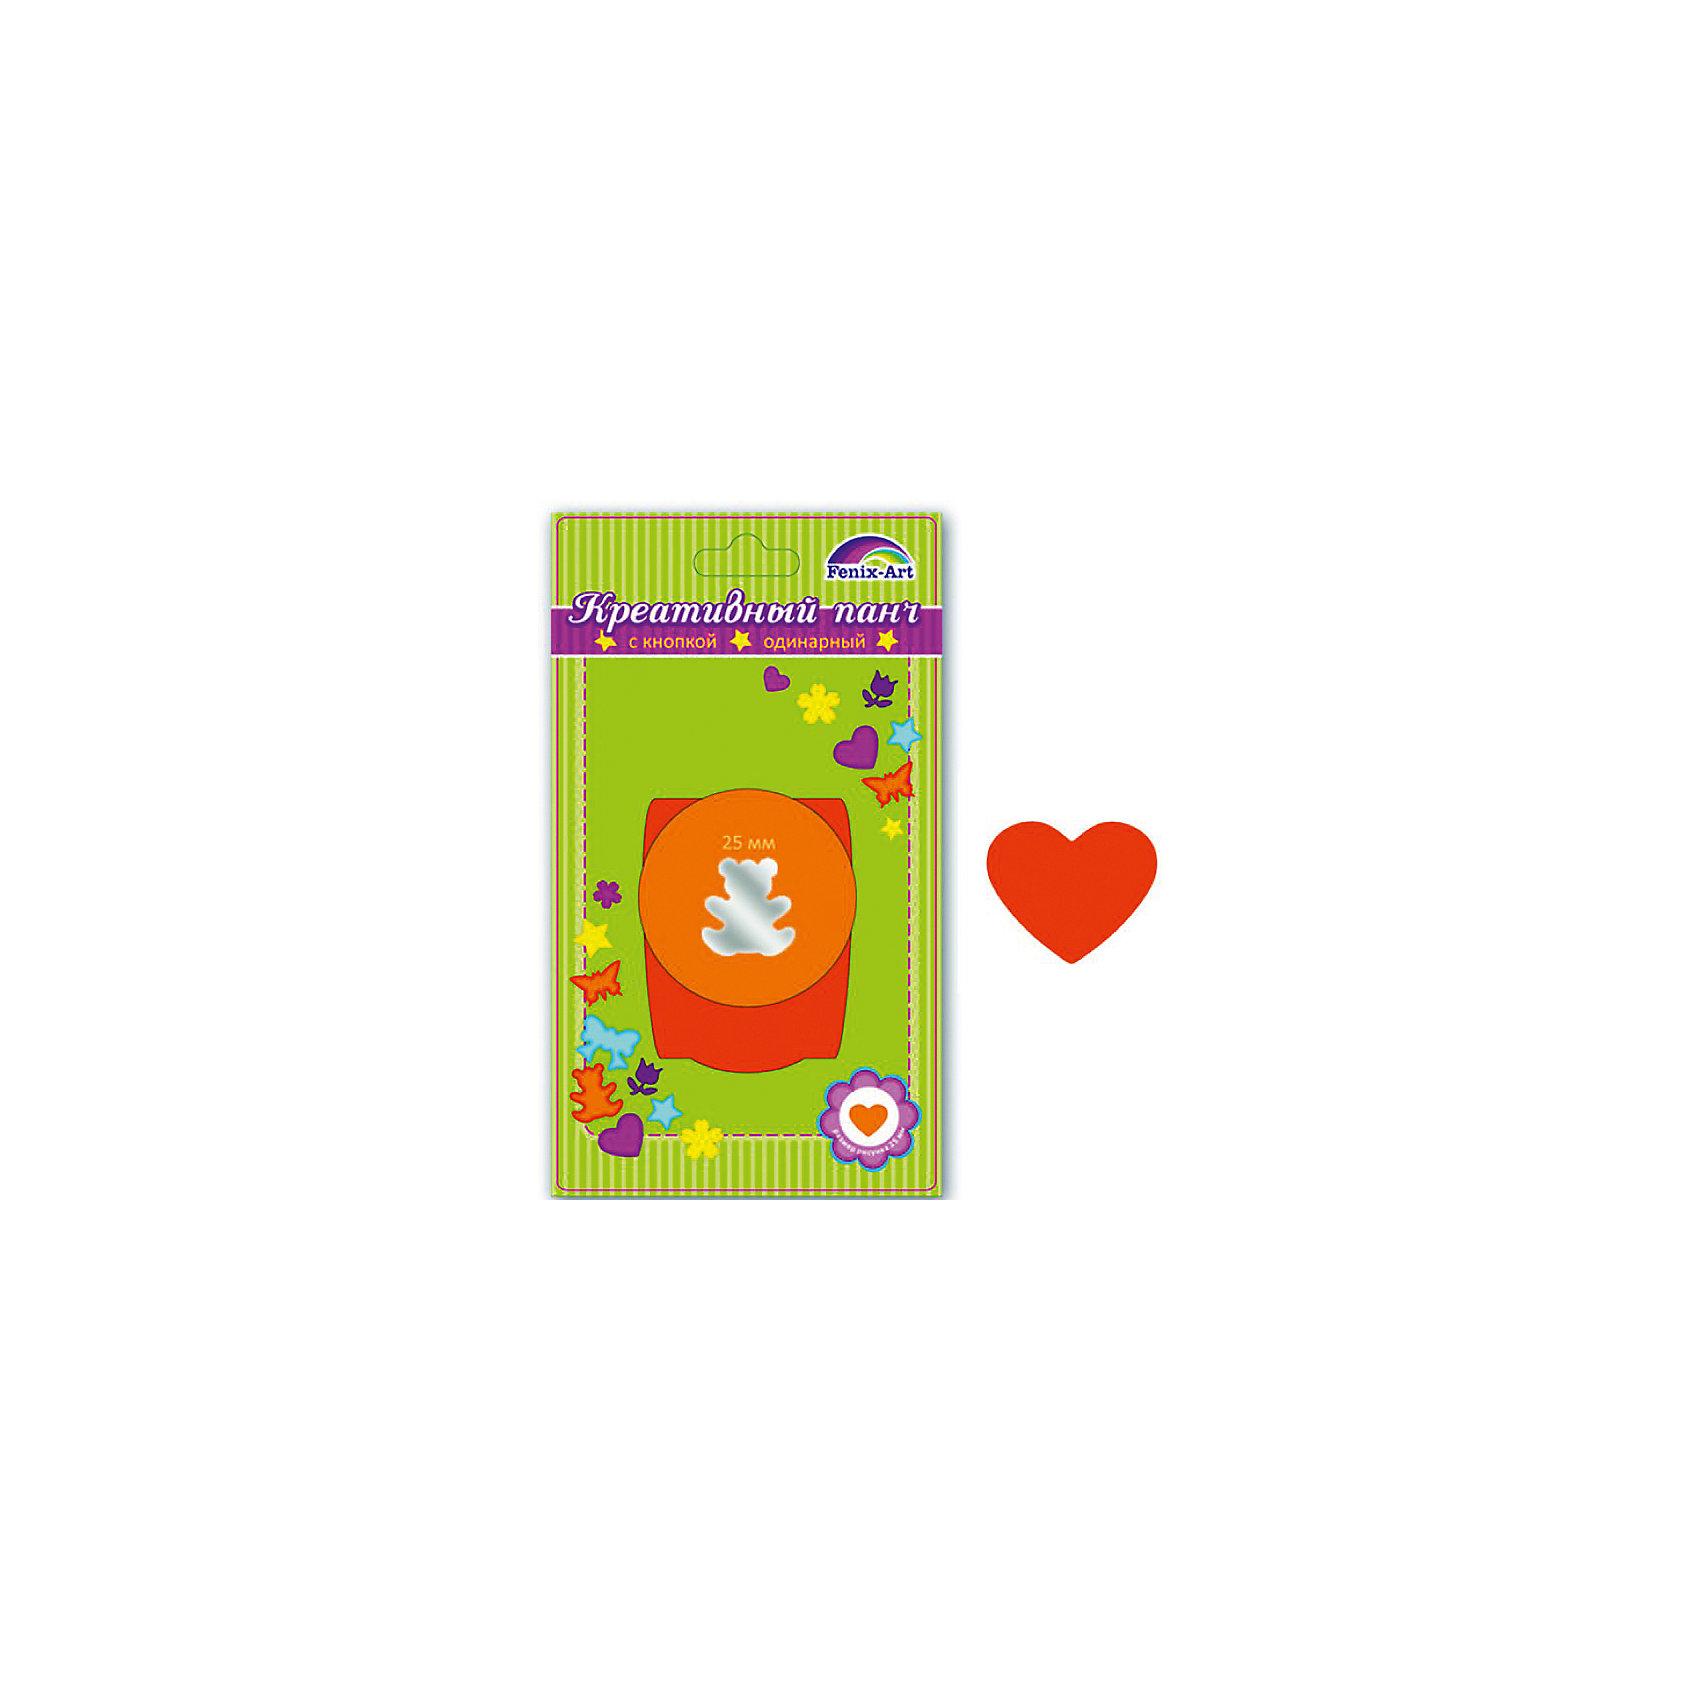 Панч-дырокол кнопочный 25мм Сердечко Феникс+Бумага<br>Панч-дырокол кнопочный СЕРДЕЧКО/25мм (размер рисунка 25мм, размер панча 62,5х44х49мм, оранжевый цвет, в блистере)<br><br>Ширина мм: 160<br>Глубина мм: 90<br>Высота мм: 50<br>Вес г: 115<br>Возраст от месяцев: 72<br>Возраст до месяцев: 2147483647<br>Пол: Унисекс<br>Возраст: Детский<br>SKU: 7046273